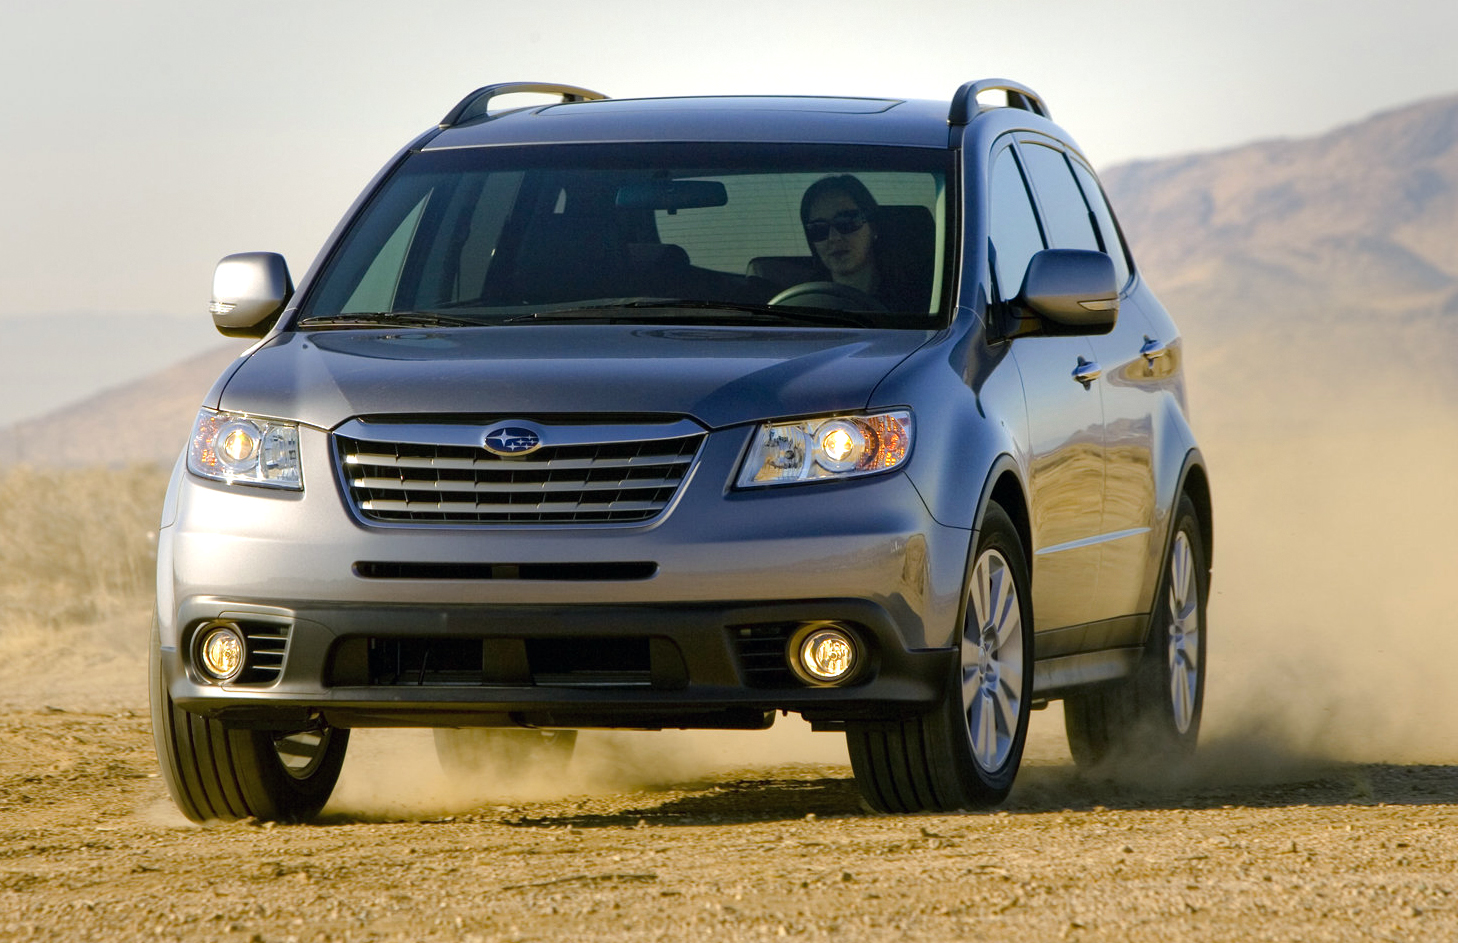 Subaru Plans Bigger Three-Row SUV To Fill Tribeca's Shoes